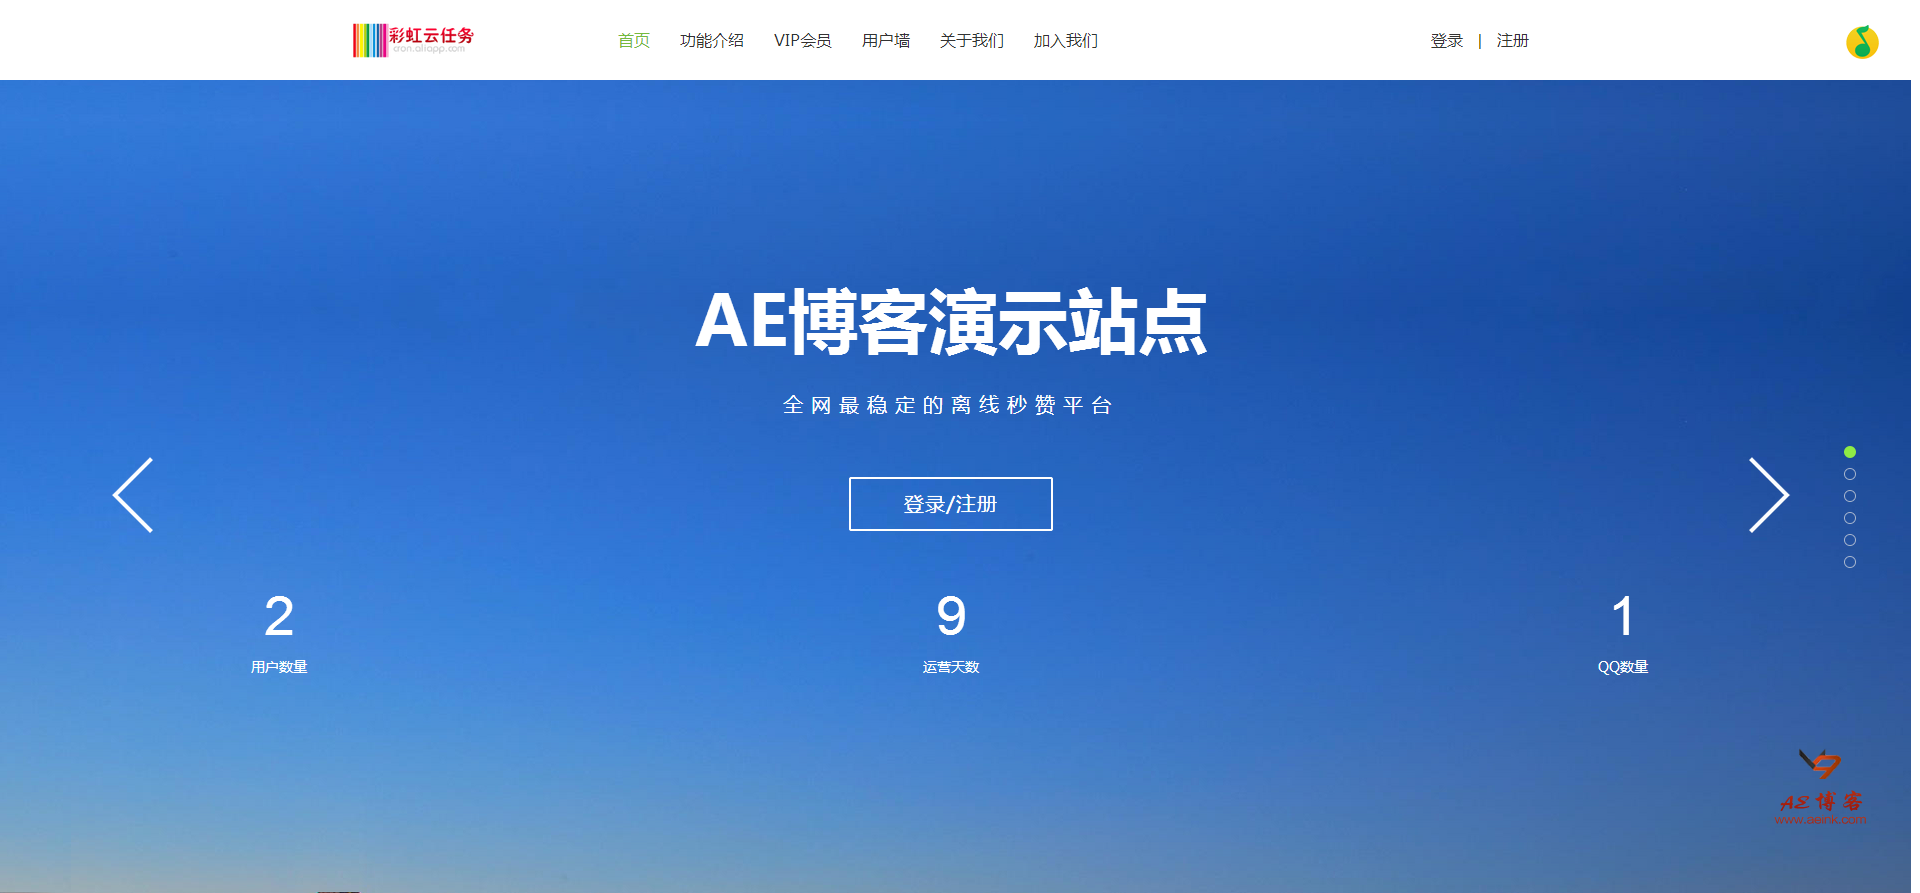 AE博客演示站点-AE博客1.png